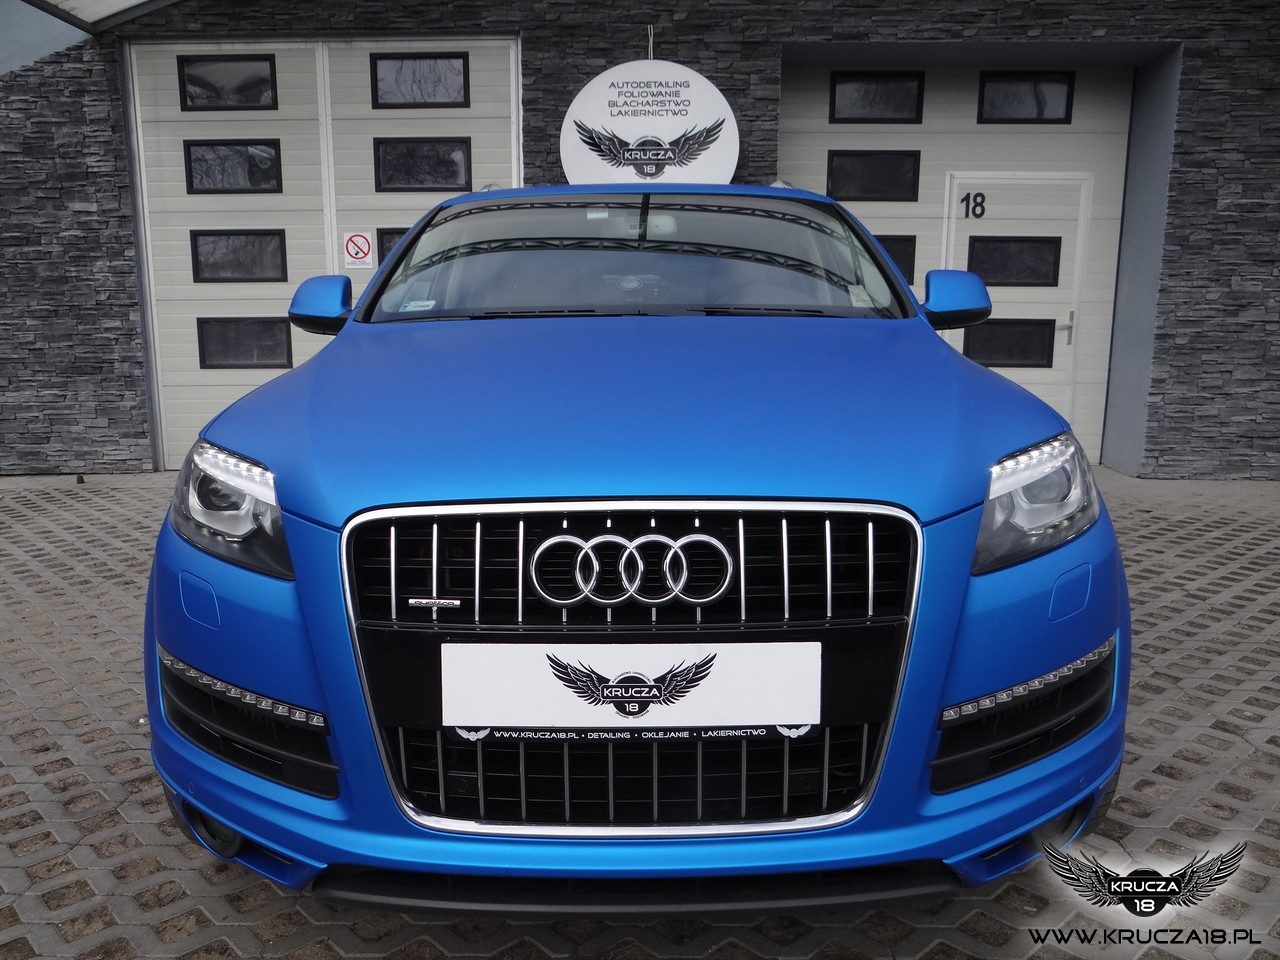 Audi Q7 - Zmiana koloru folią  Blue Aluminium